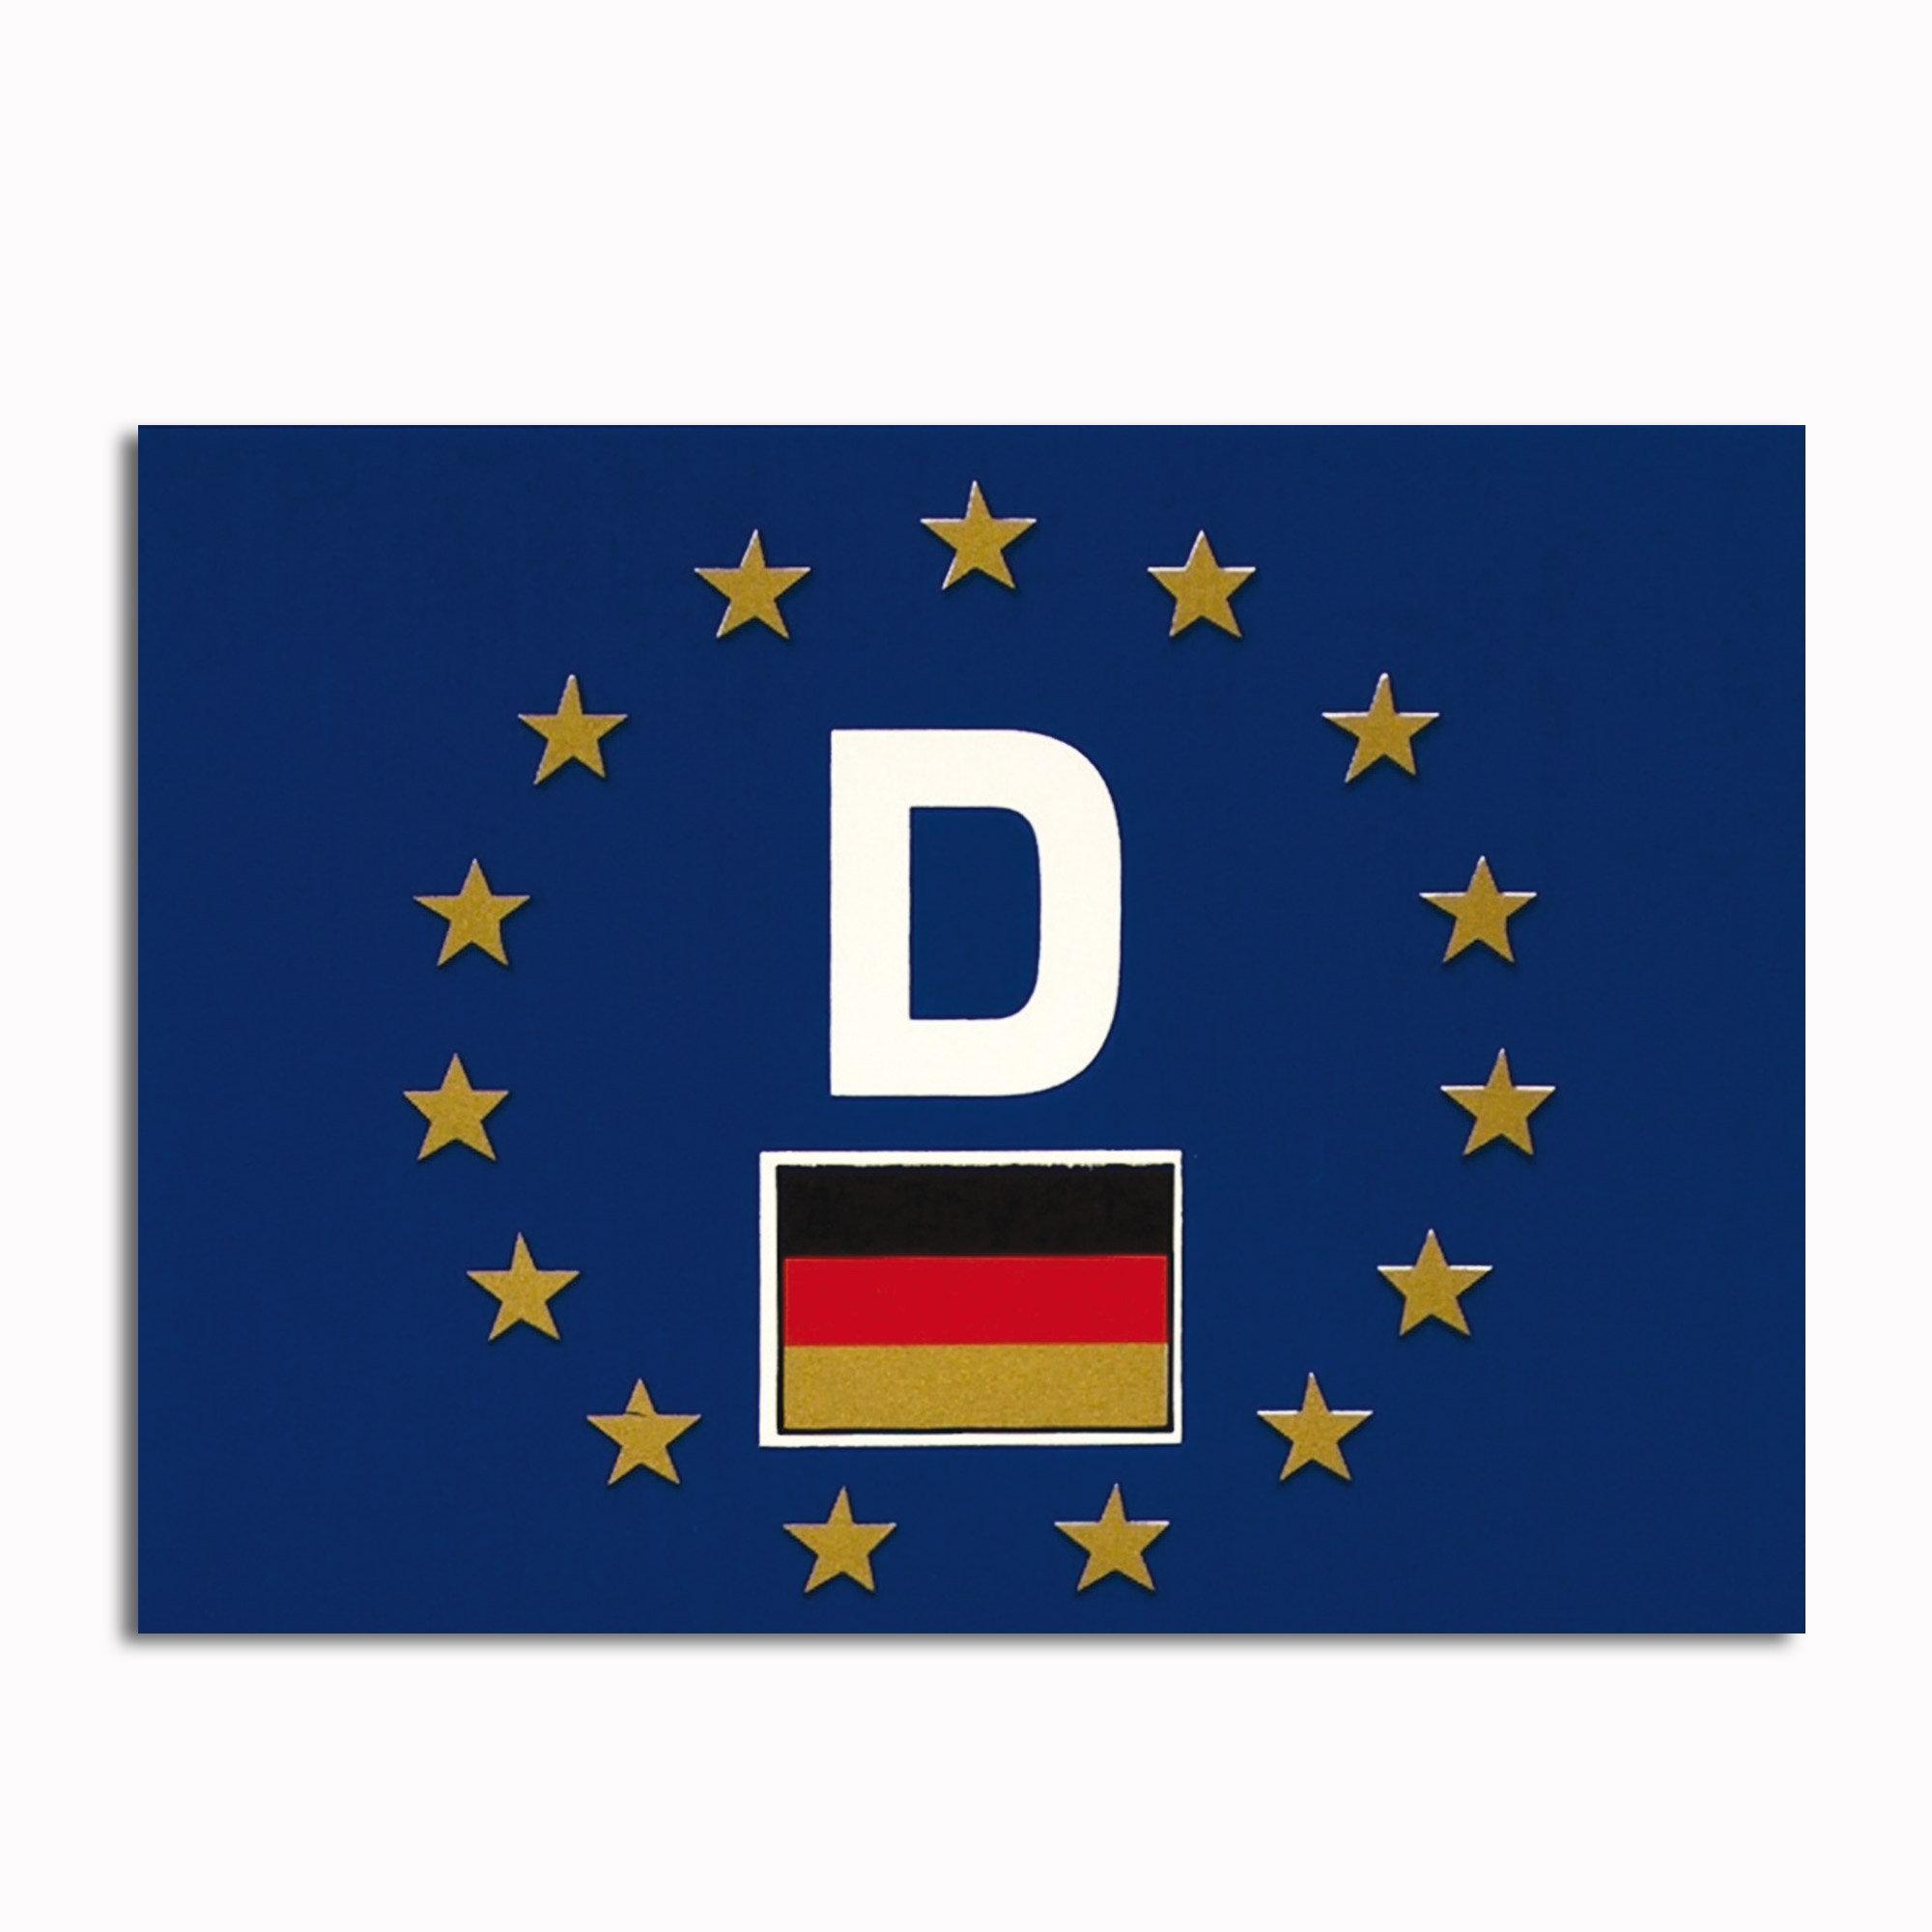 Autocollant Voiture D-Europe